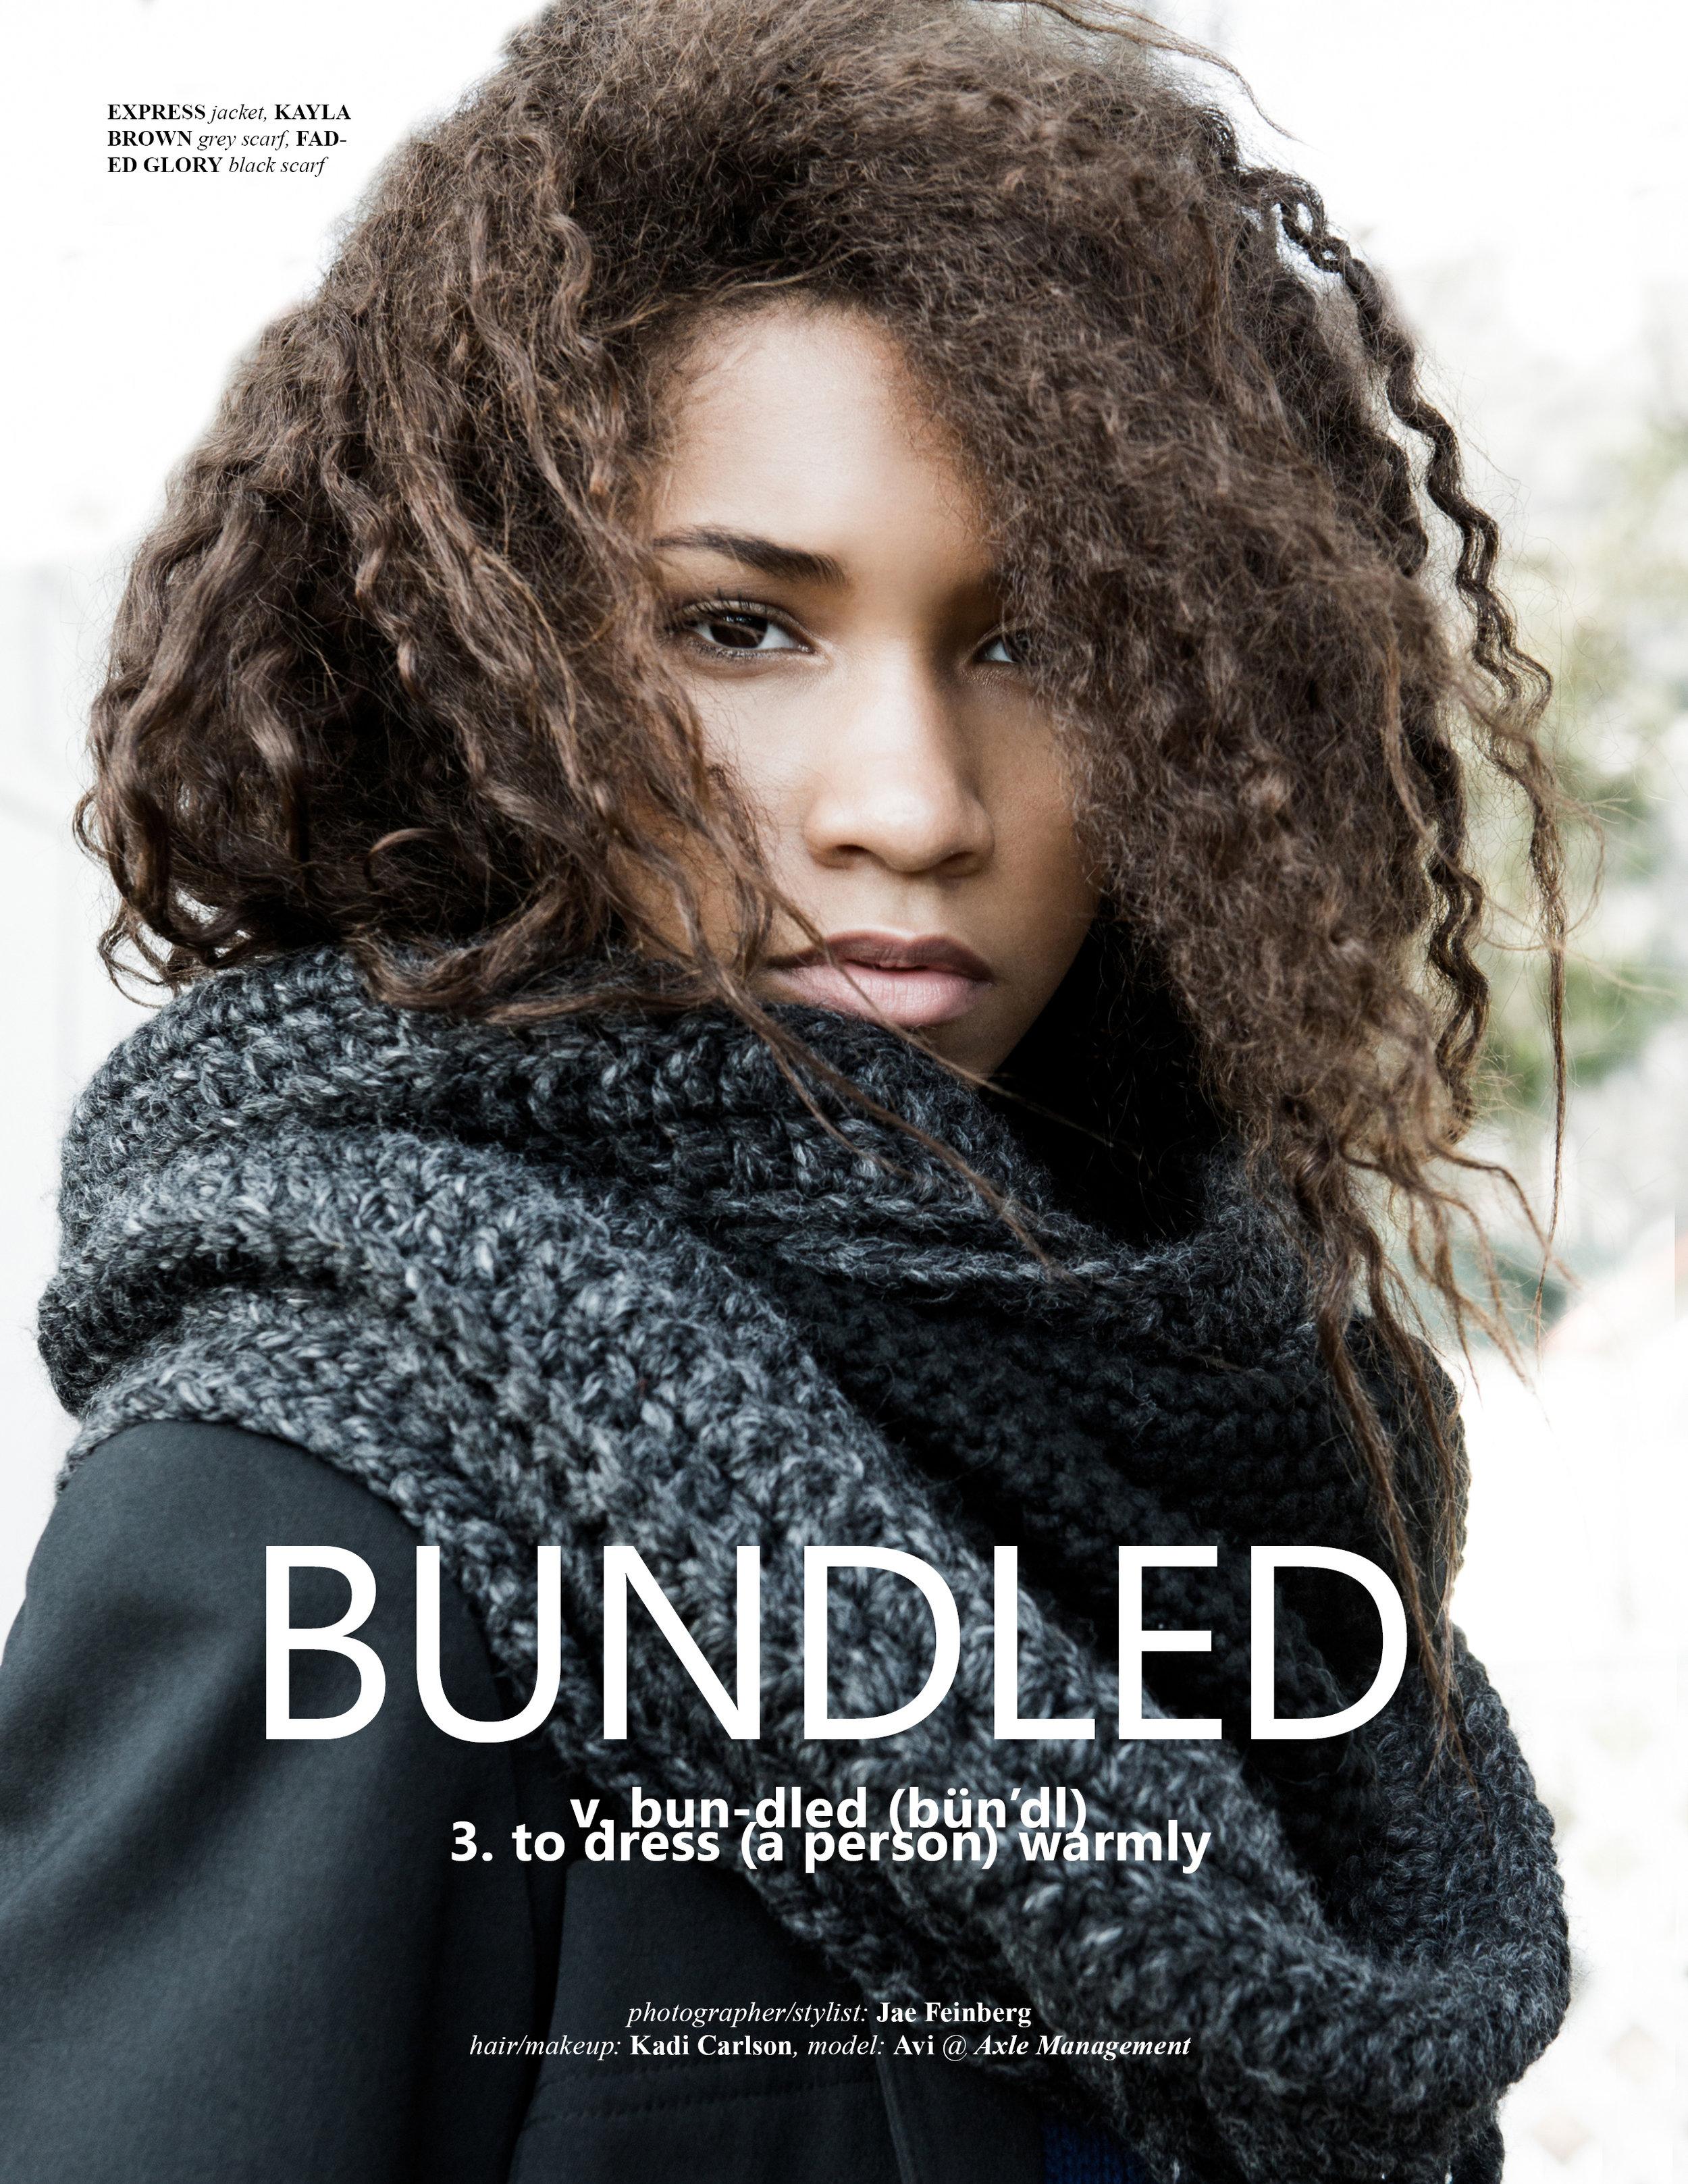 Bundled